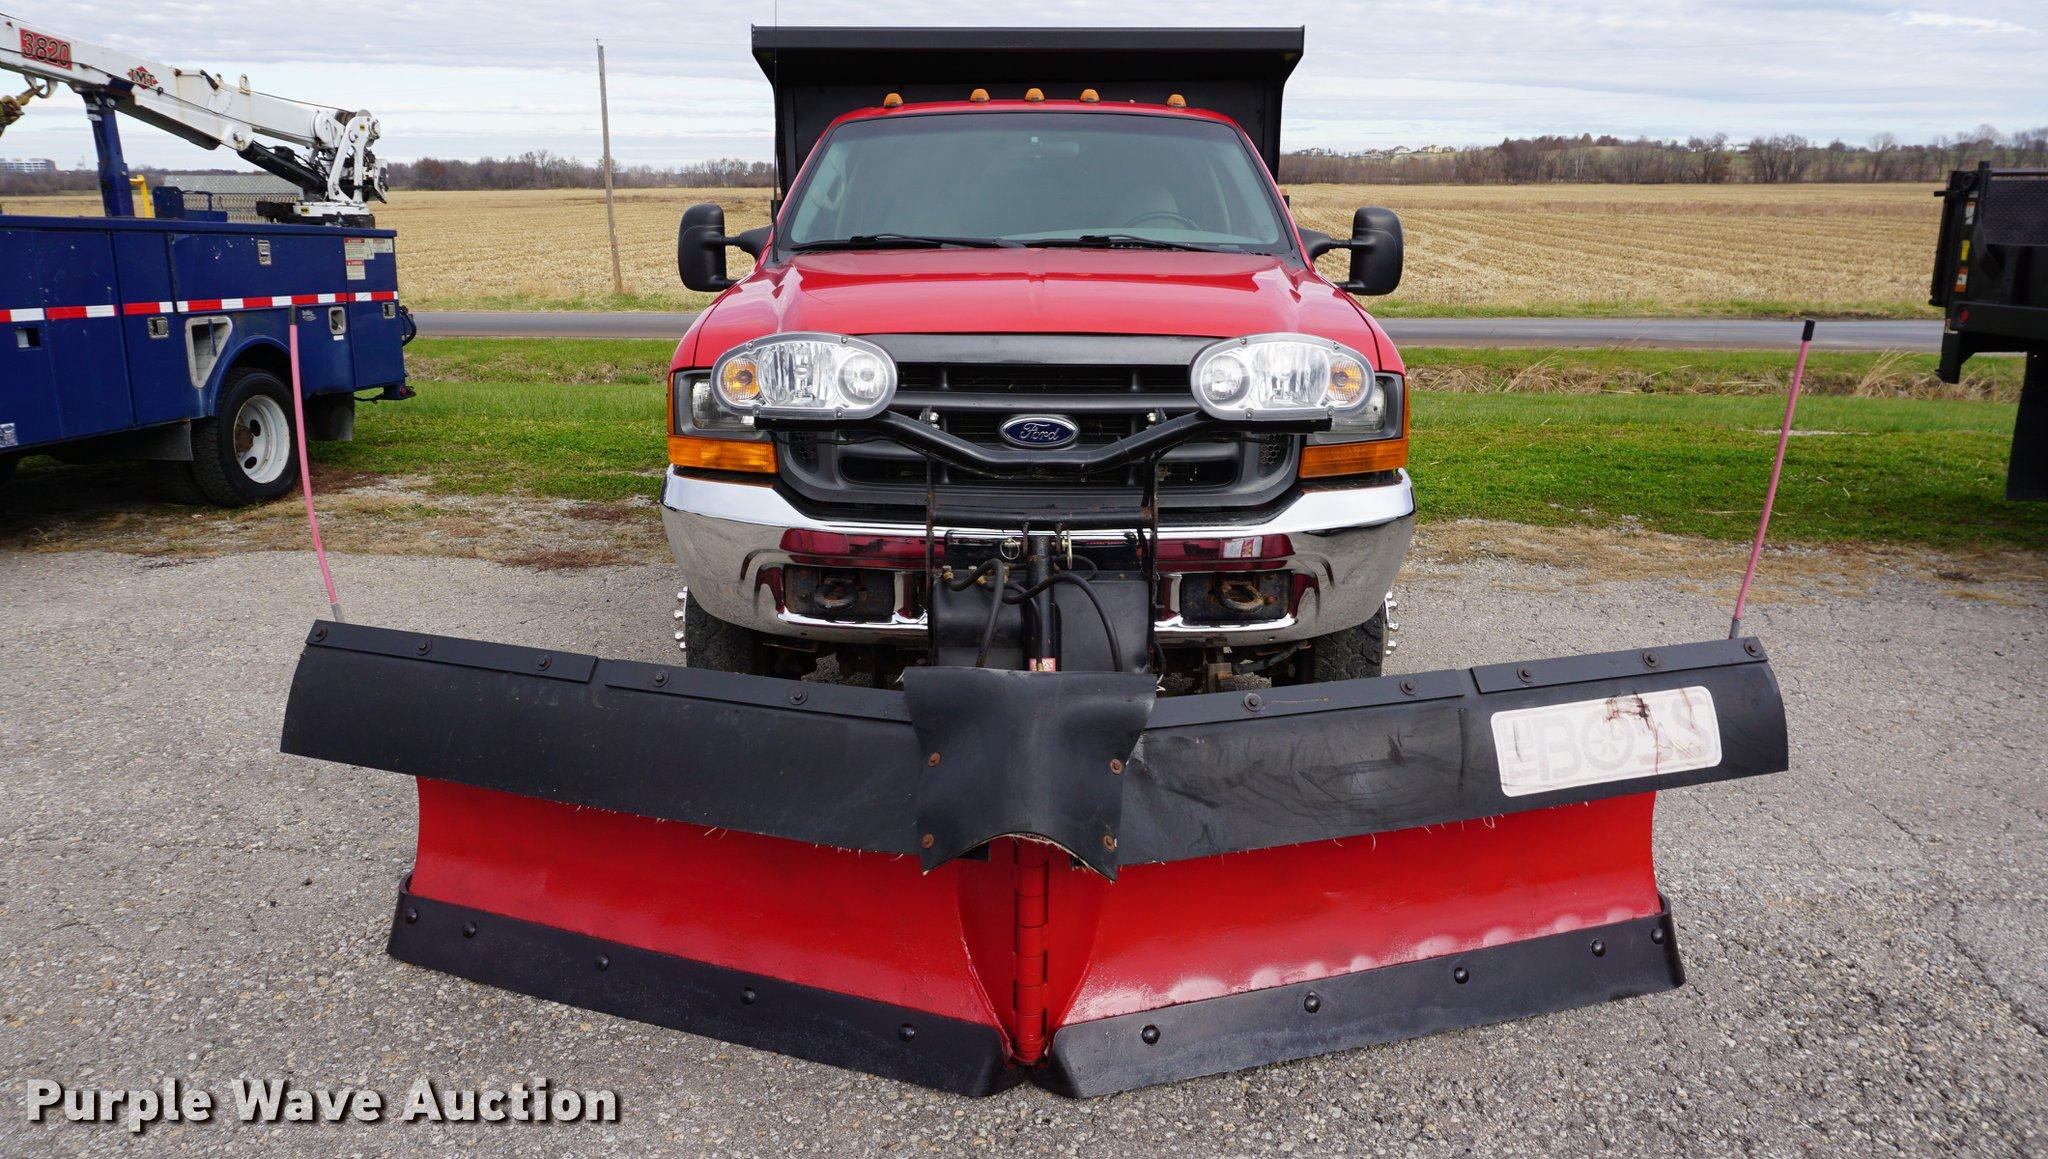 2001 Ford F350 Super Duty Dump Bed Pickup Truck Item Da146 01 F250 Boss Plow Wiring Diagram Full Size In New Window